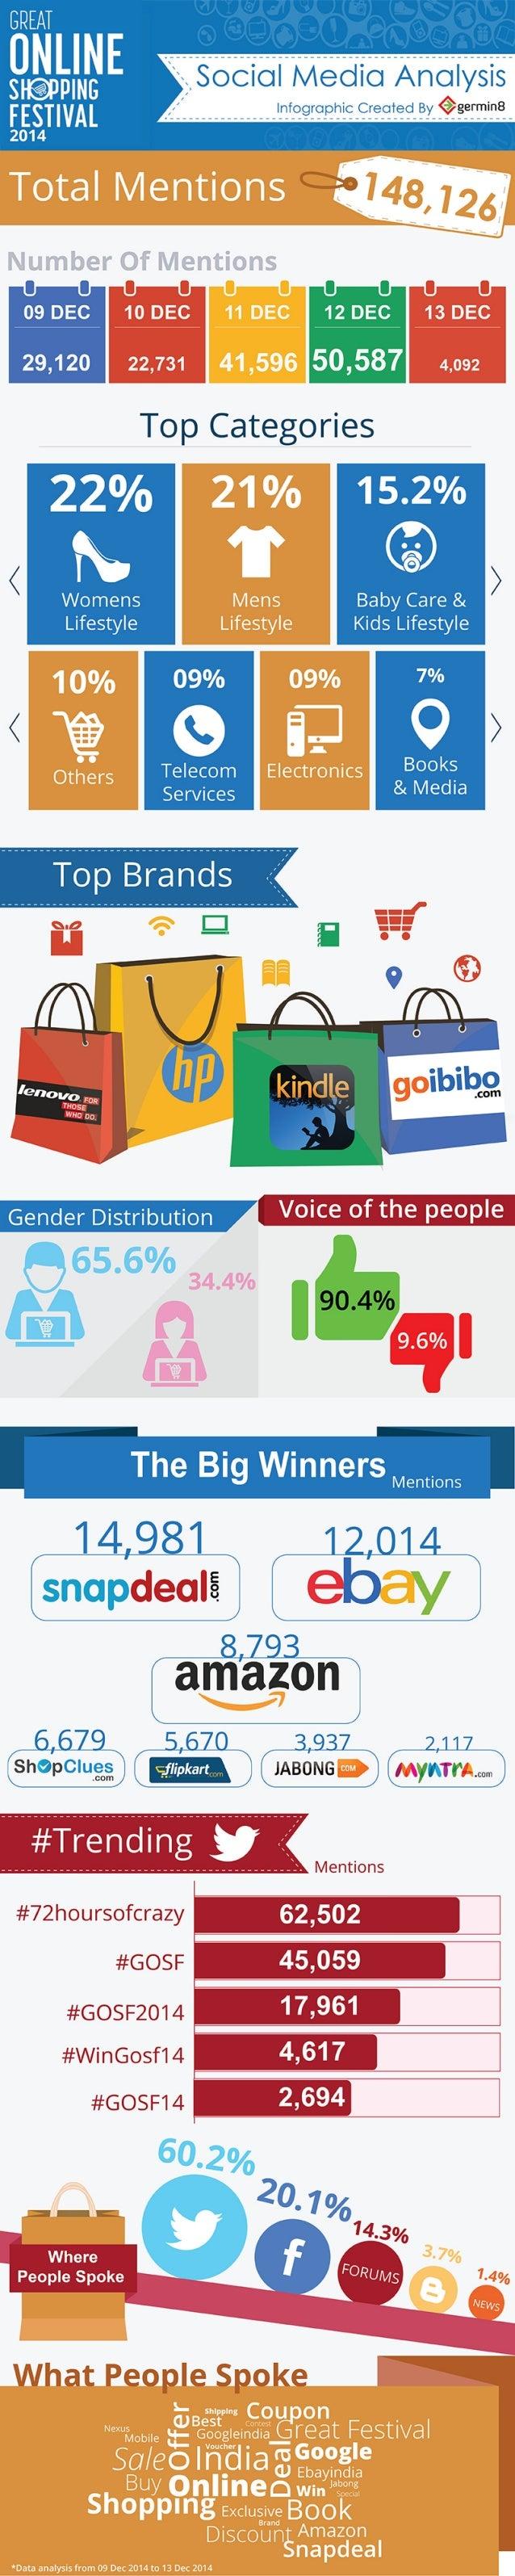 GOSF 2014 : Social Media Analysis